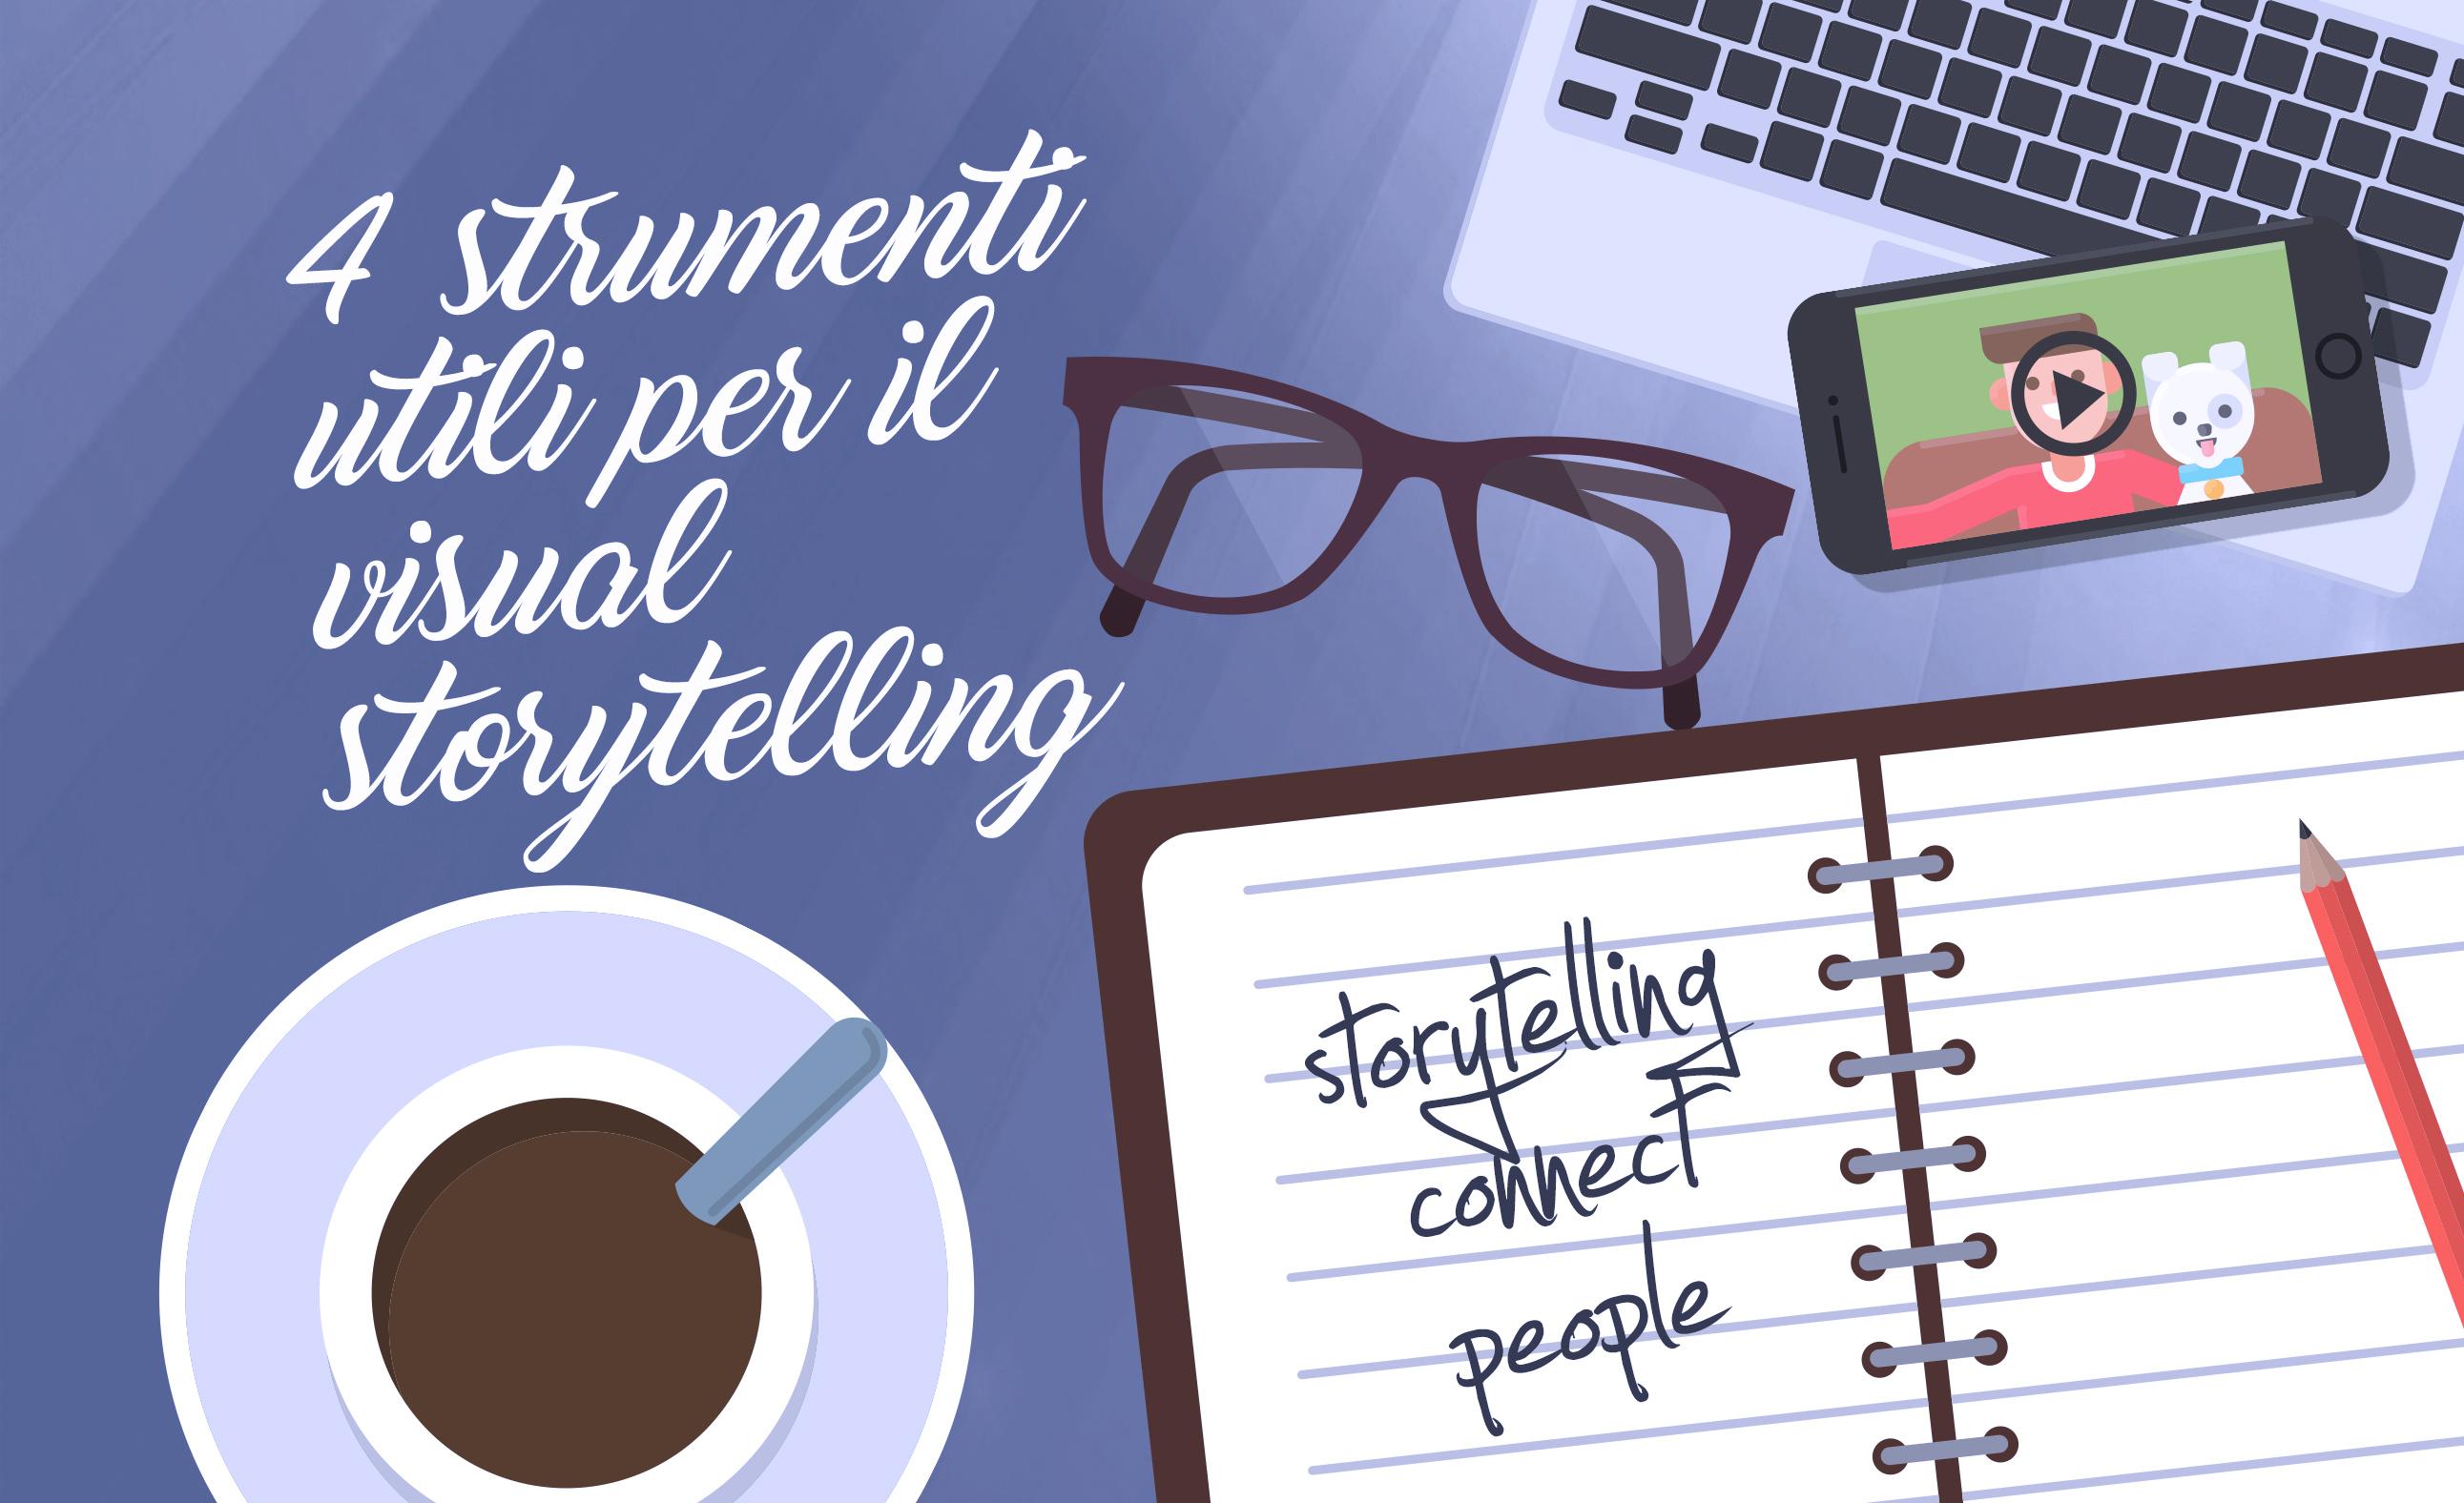 4-strumenti-utili-per-il-visual-storytelling